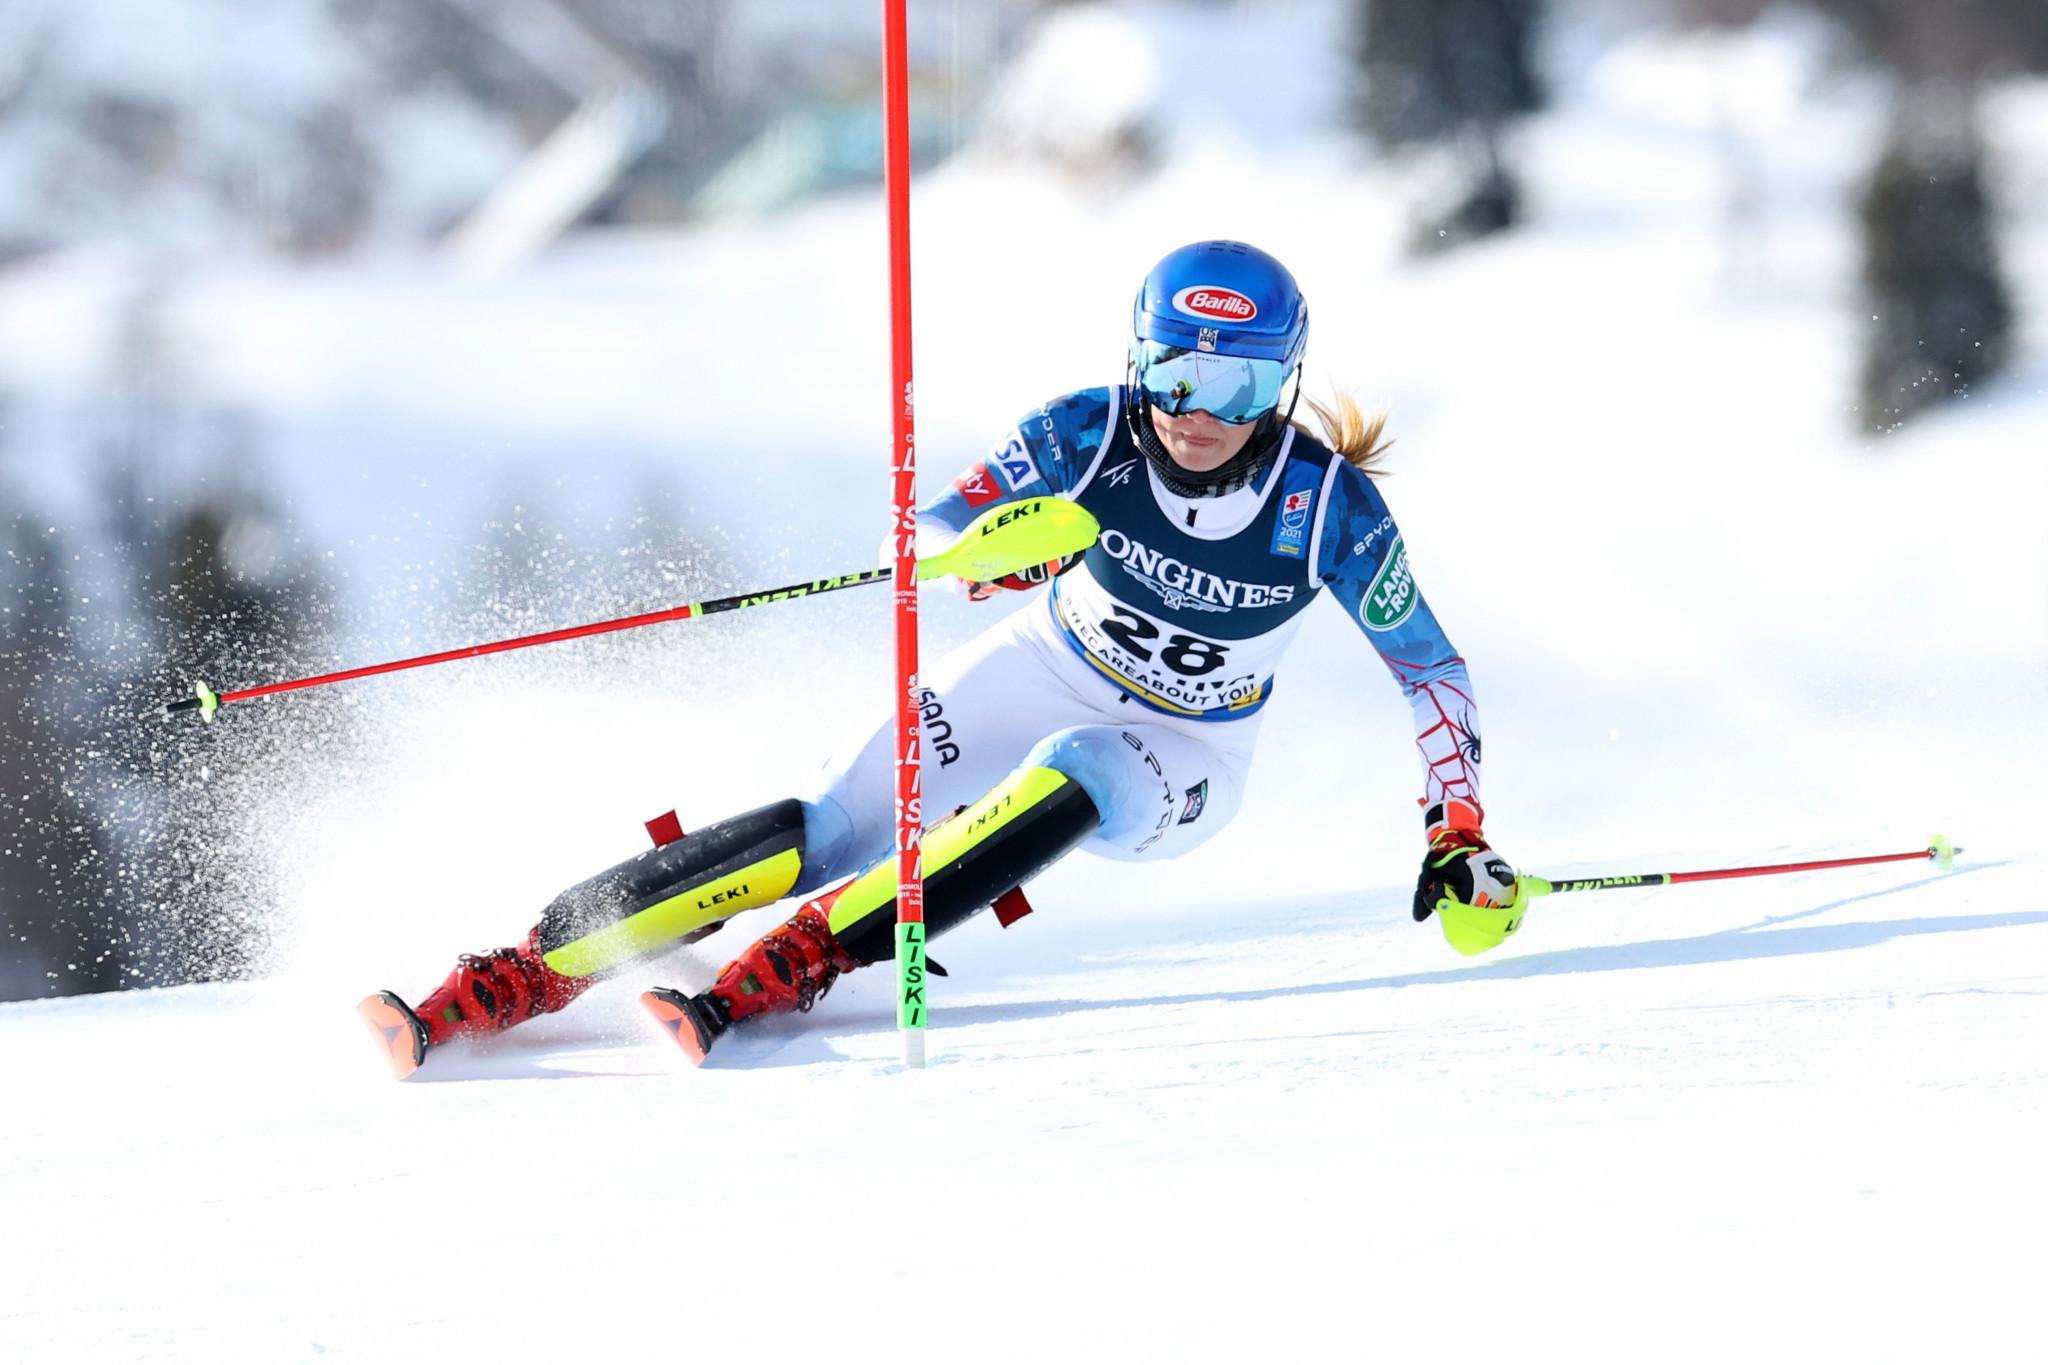 Shiffrin earns record-breaking sixth title at FIS Alpine Ski World Championships